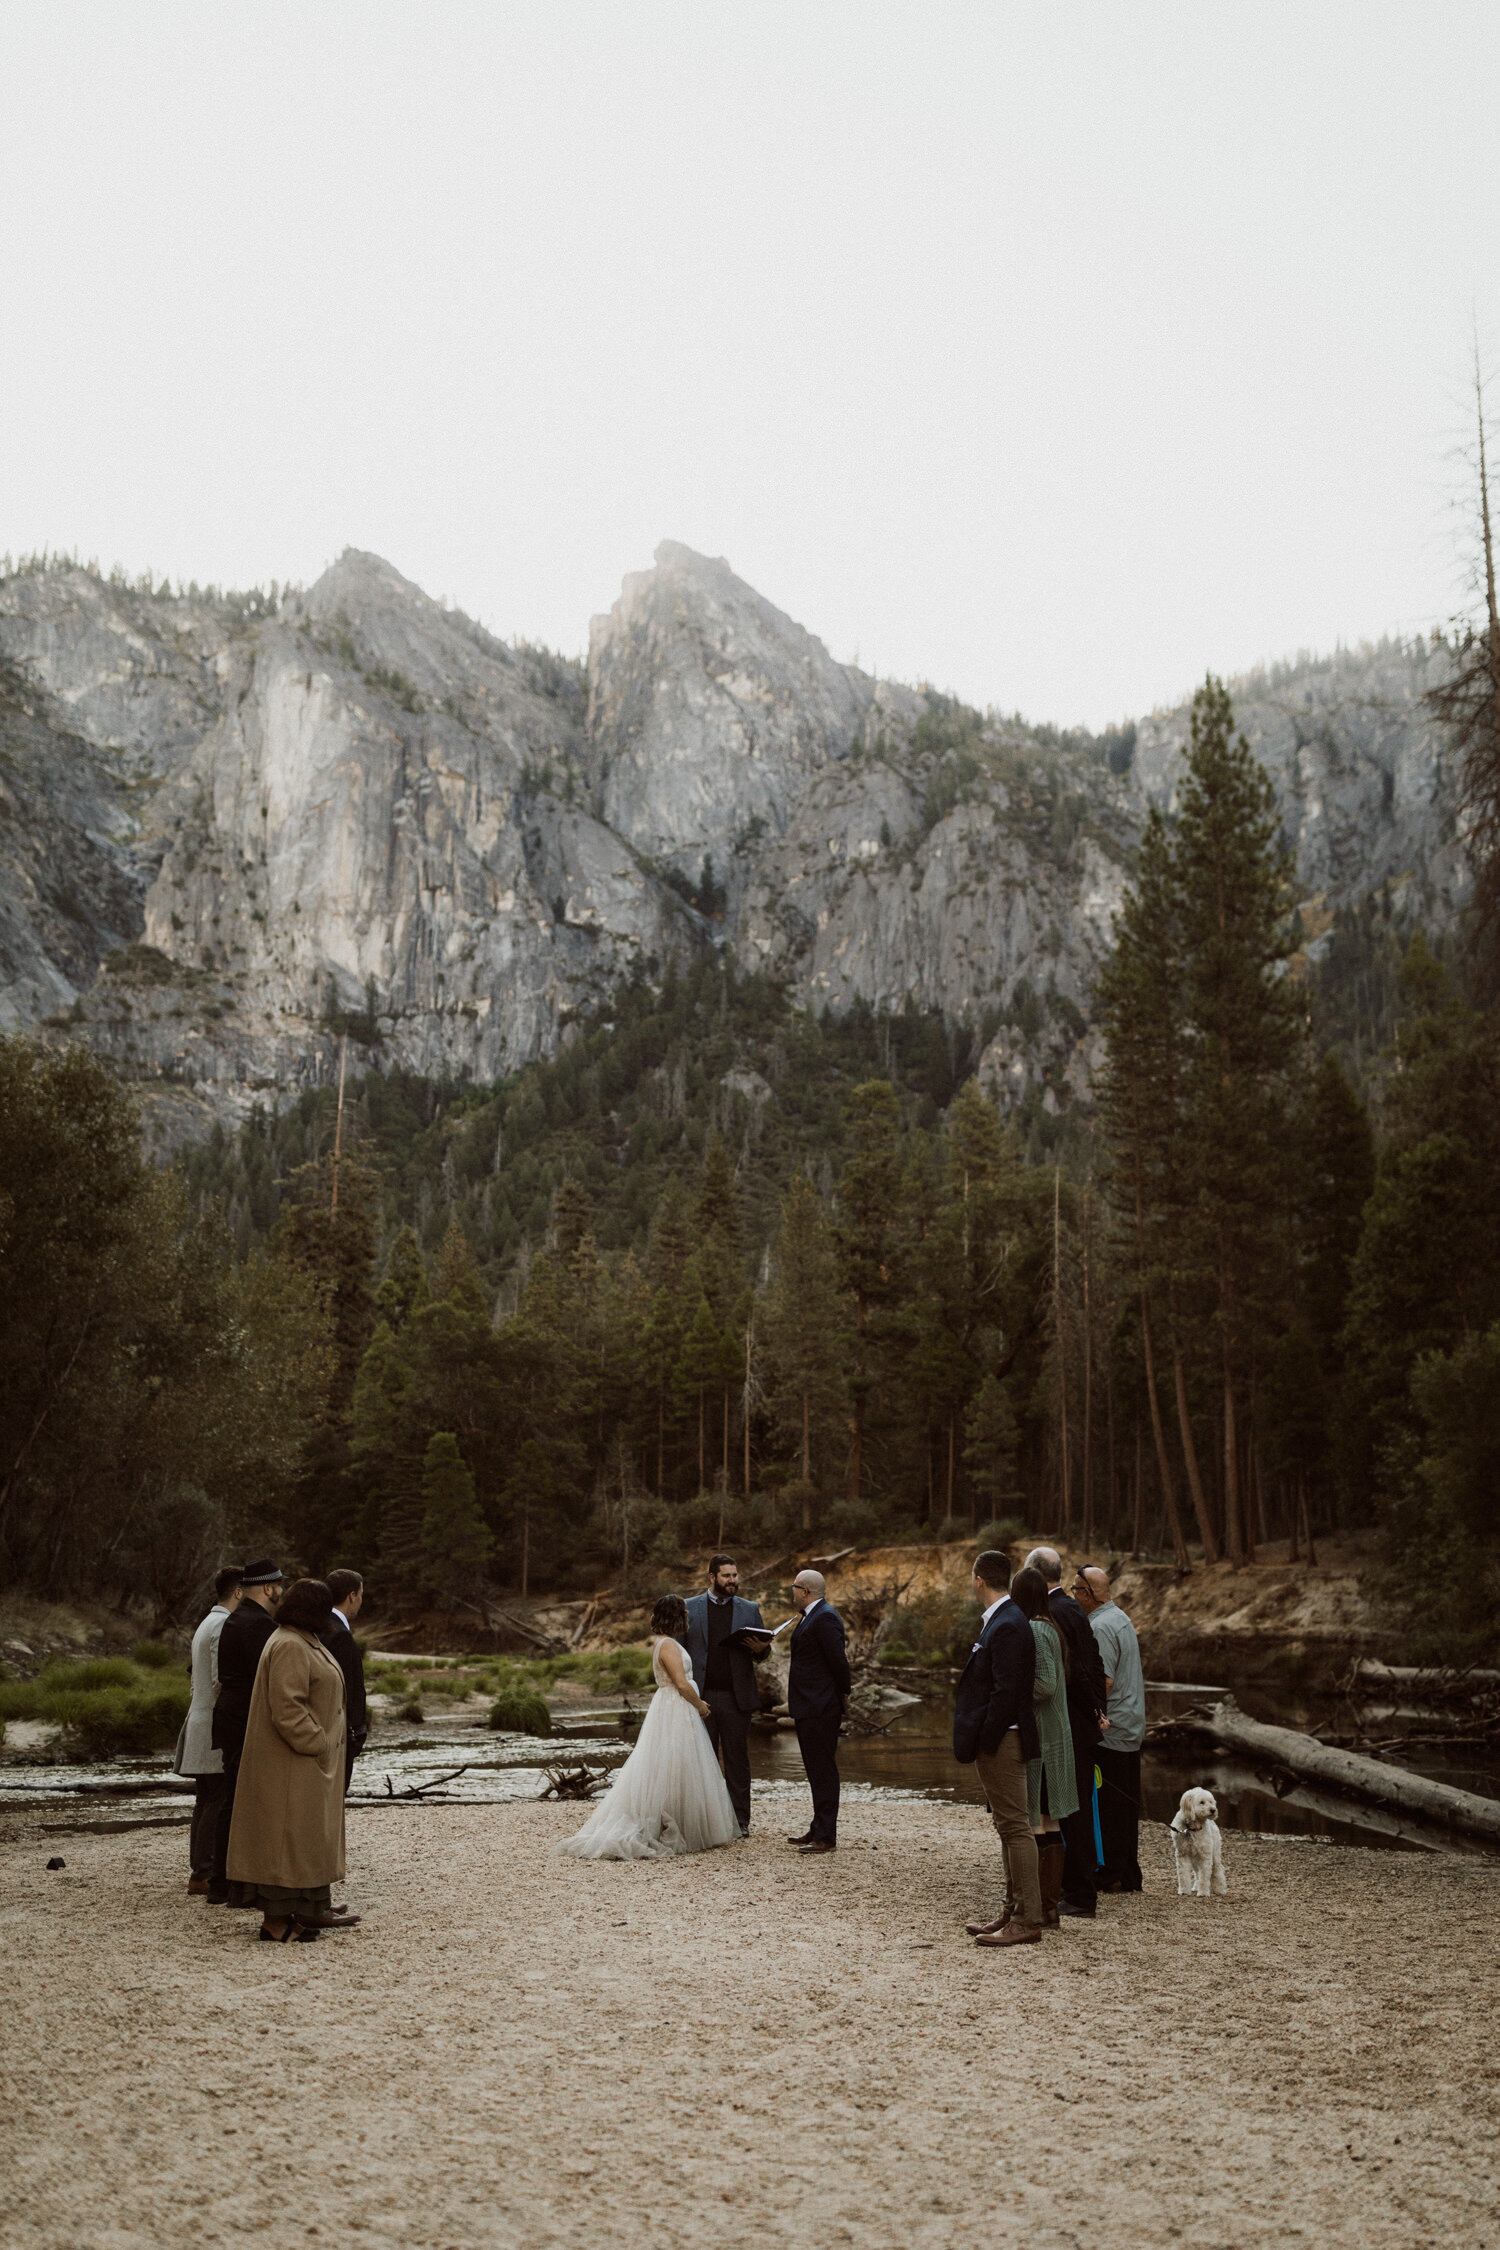 adventure-wedding-yosemite-national-park-14.jpg